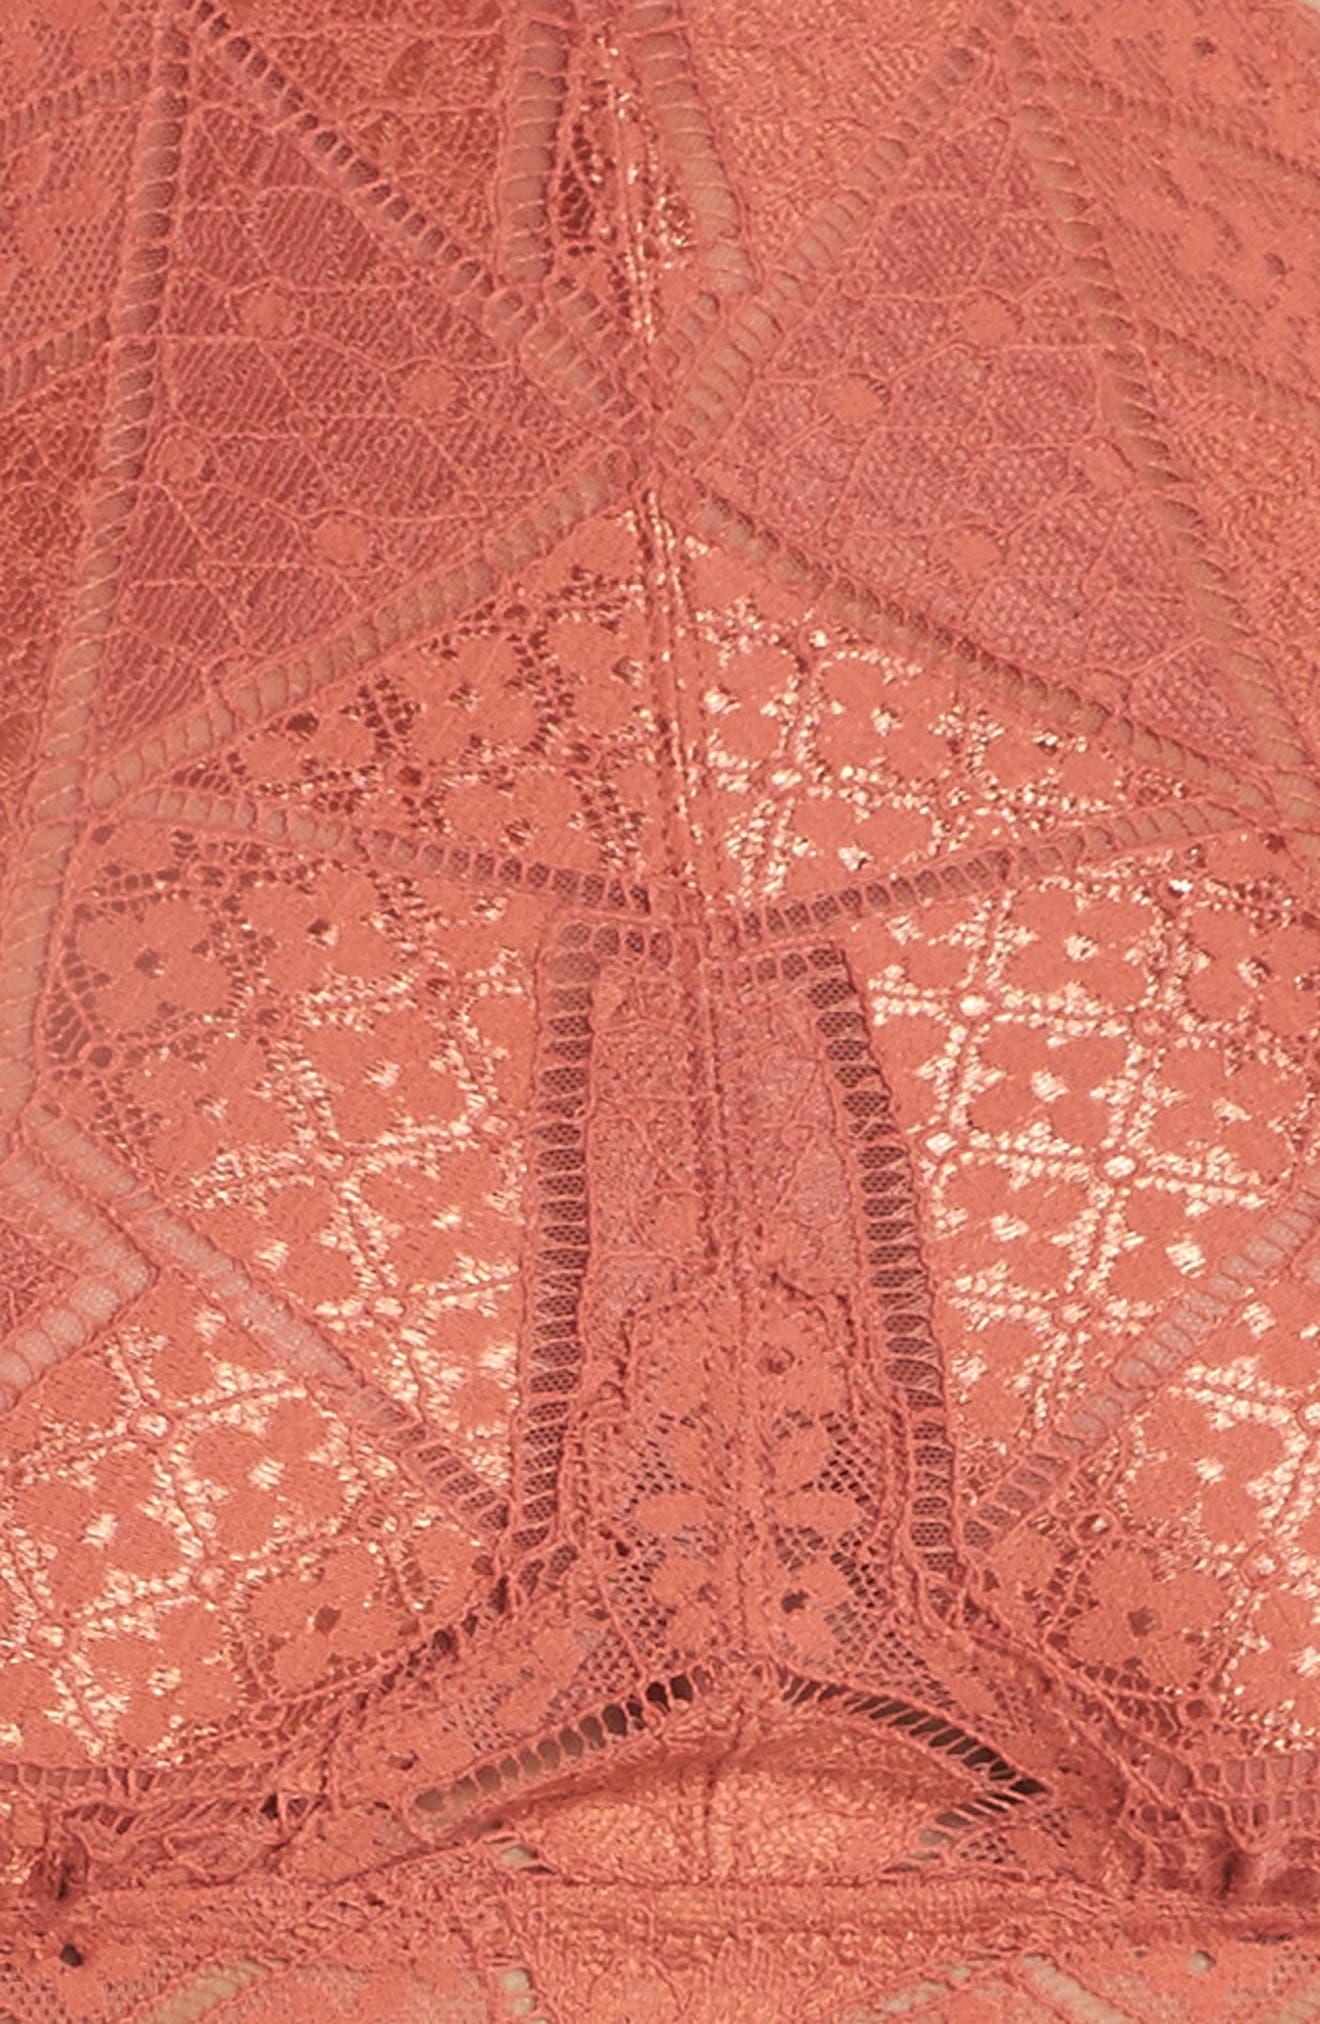 Intimately FP Moonstruck Lace Longline Halter Bralette,                             Alternate thumbnail 16, color,